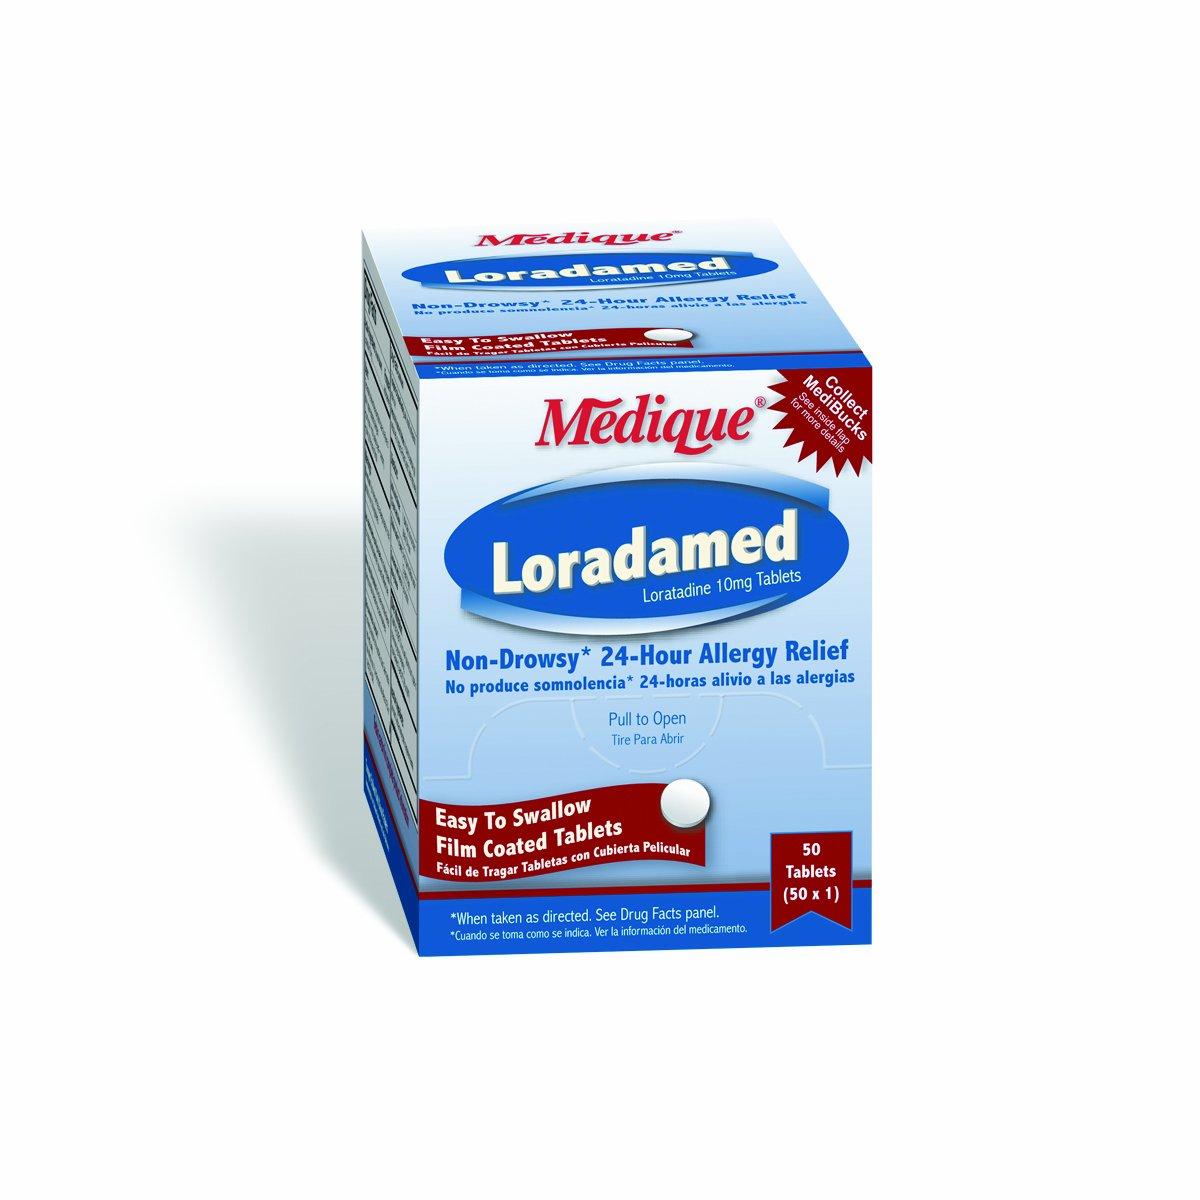 Medique 20350 Loradamed, 50 Tablets